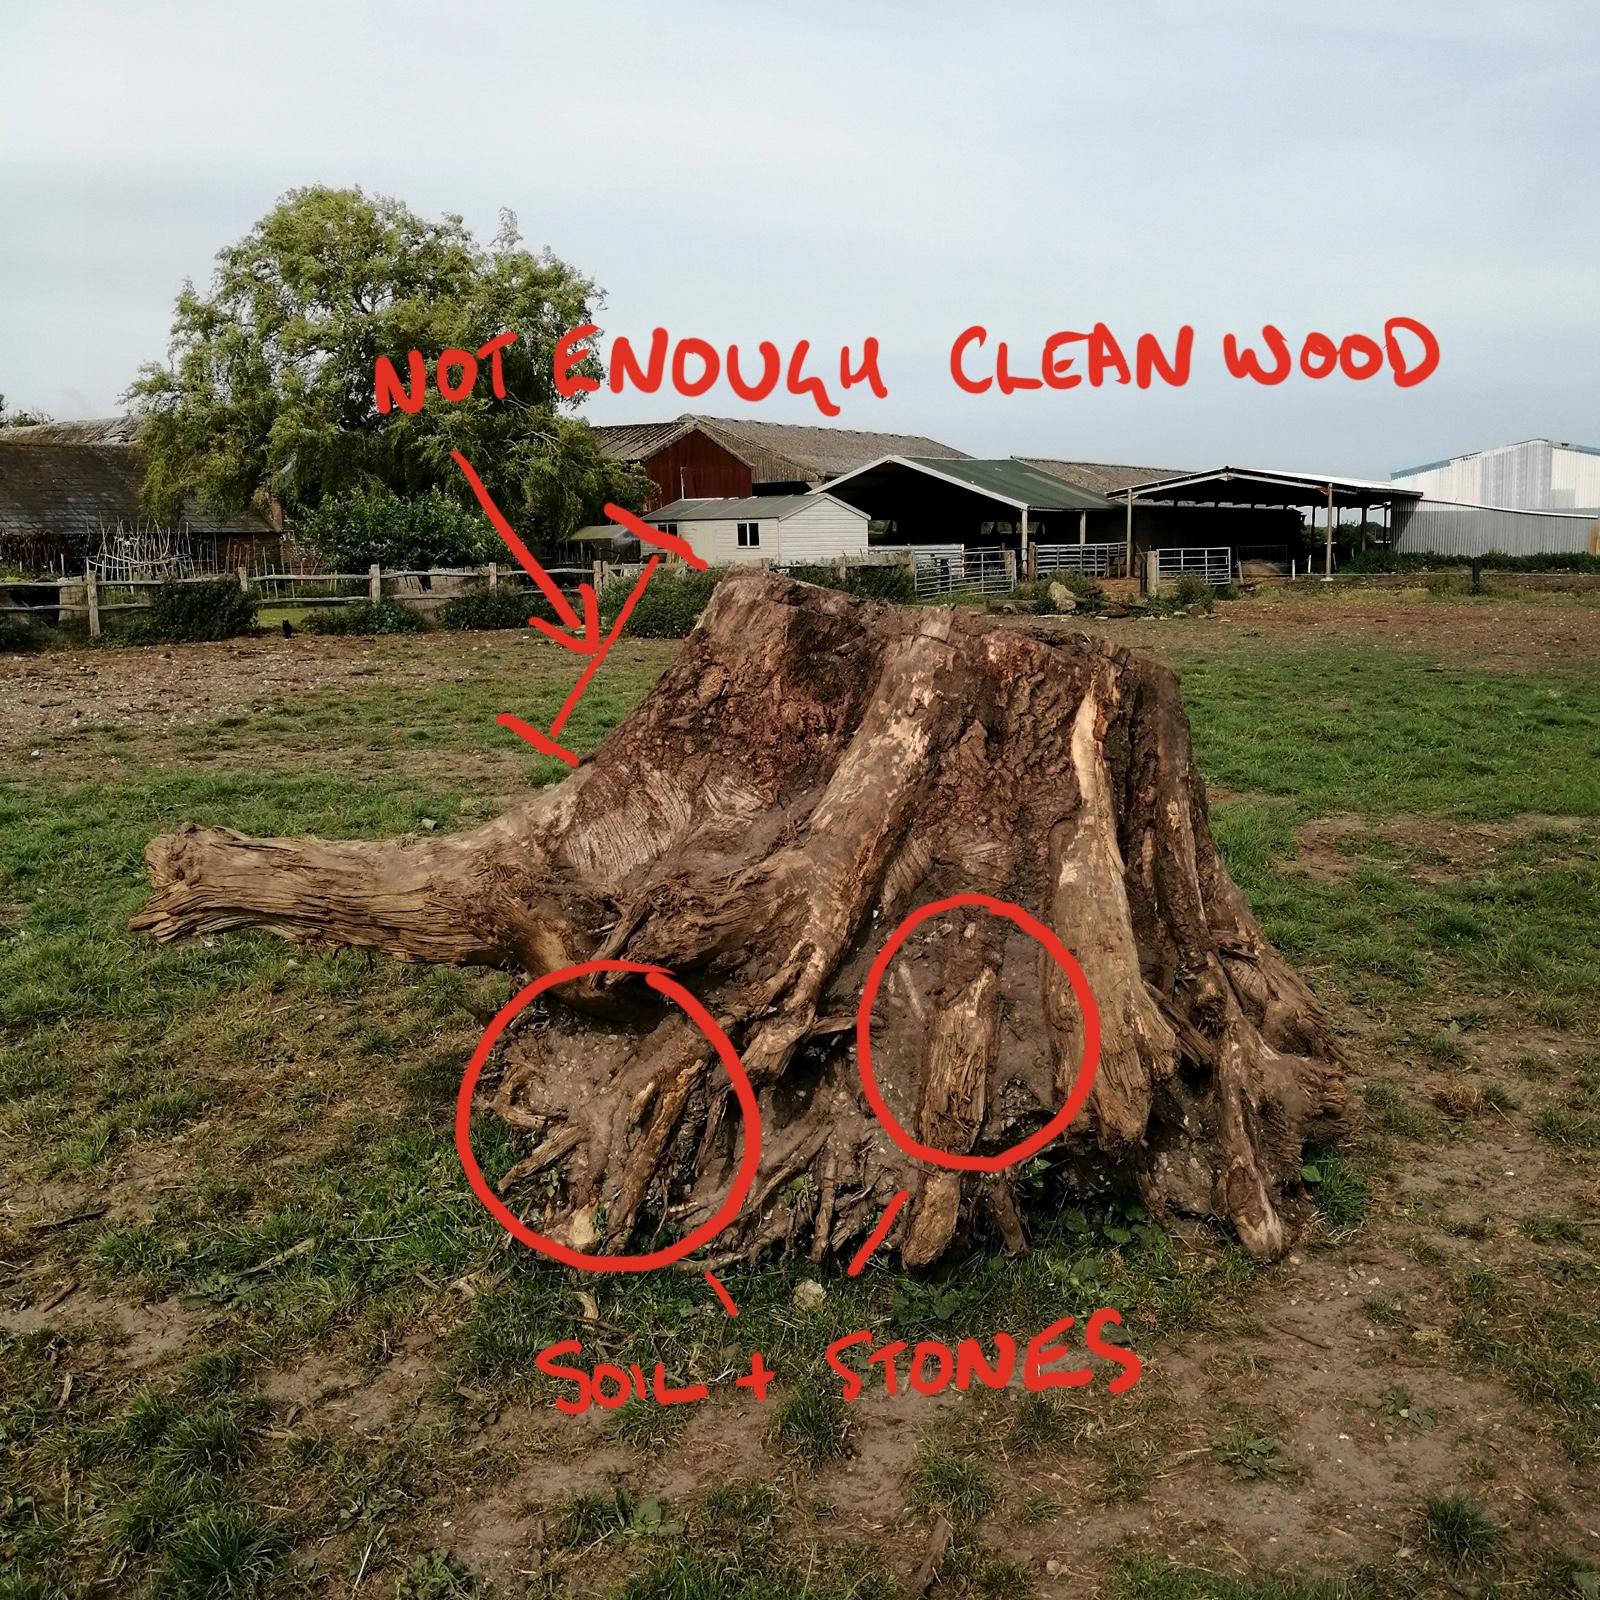 Unsuitable tree for a sculpture